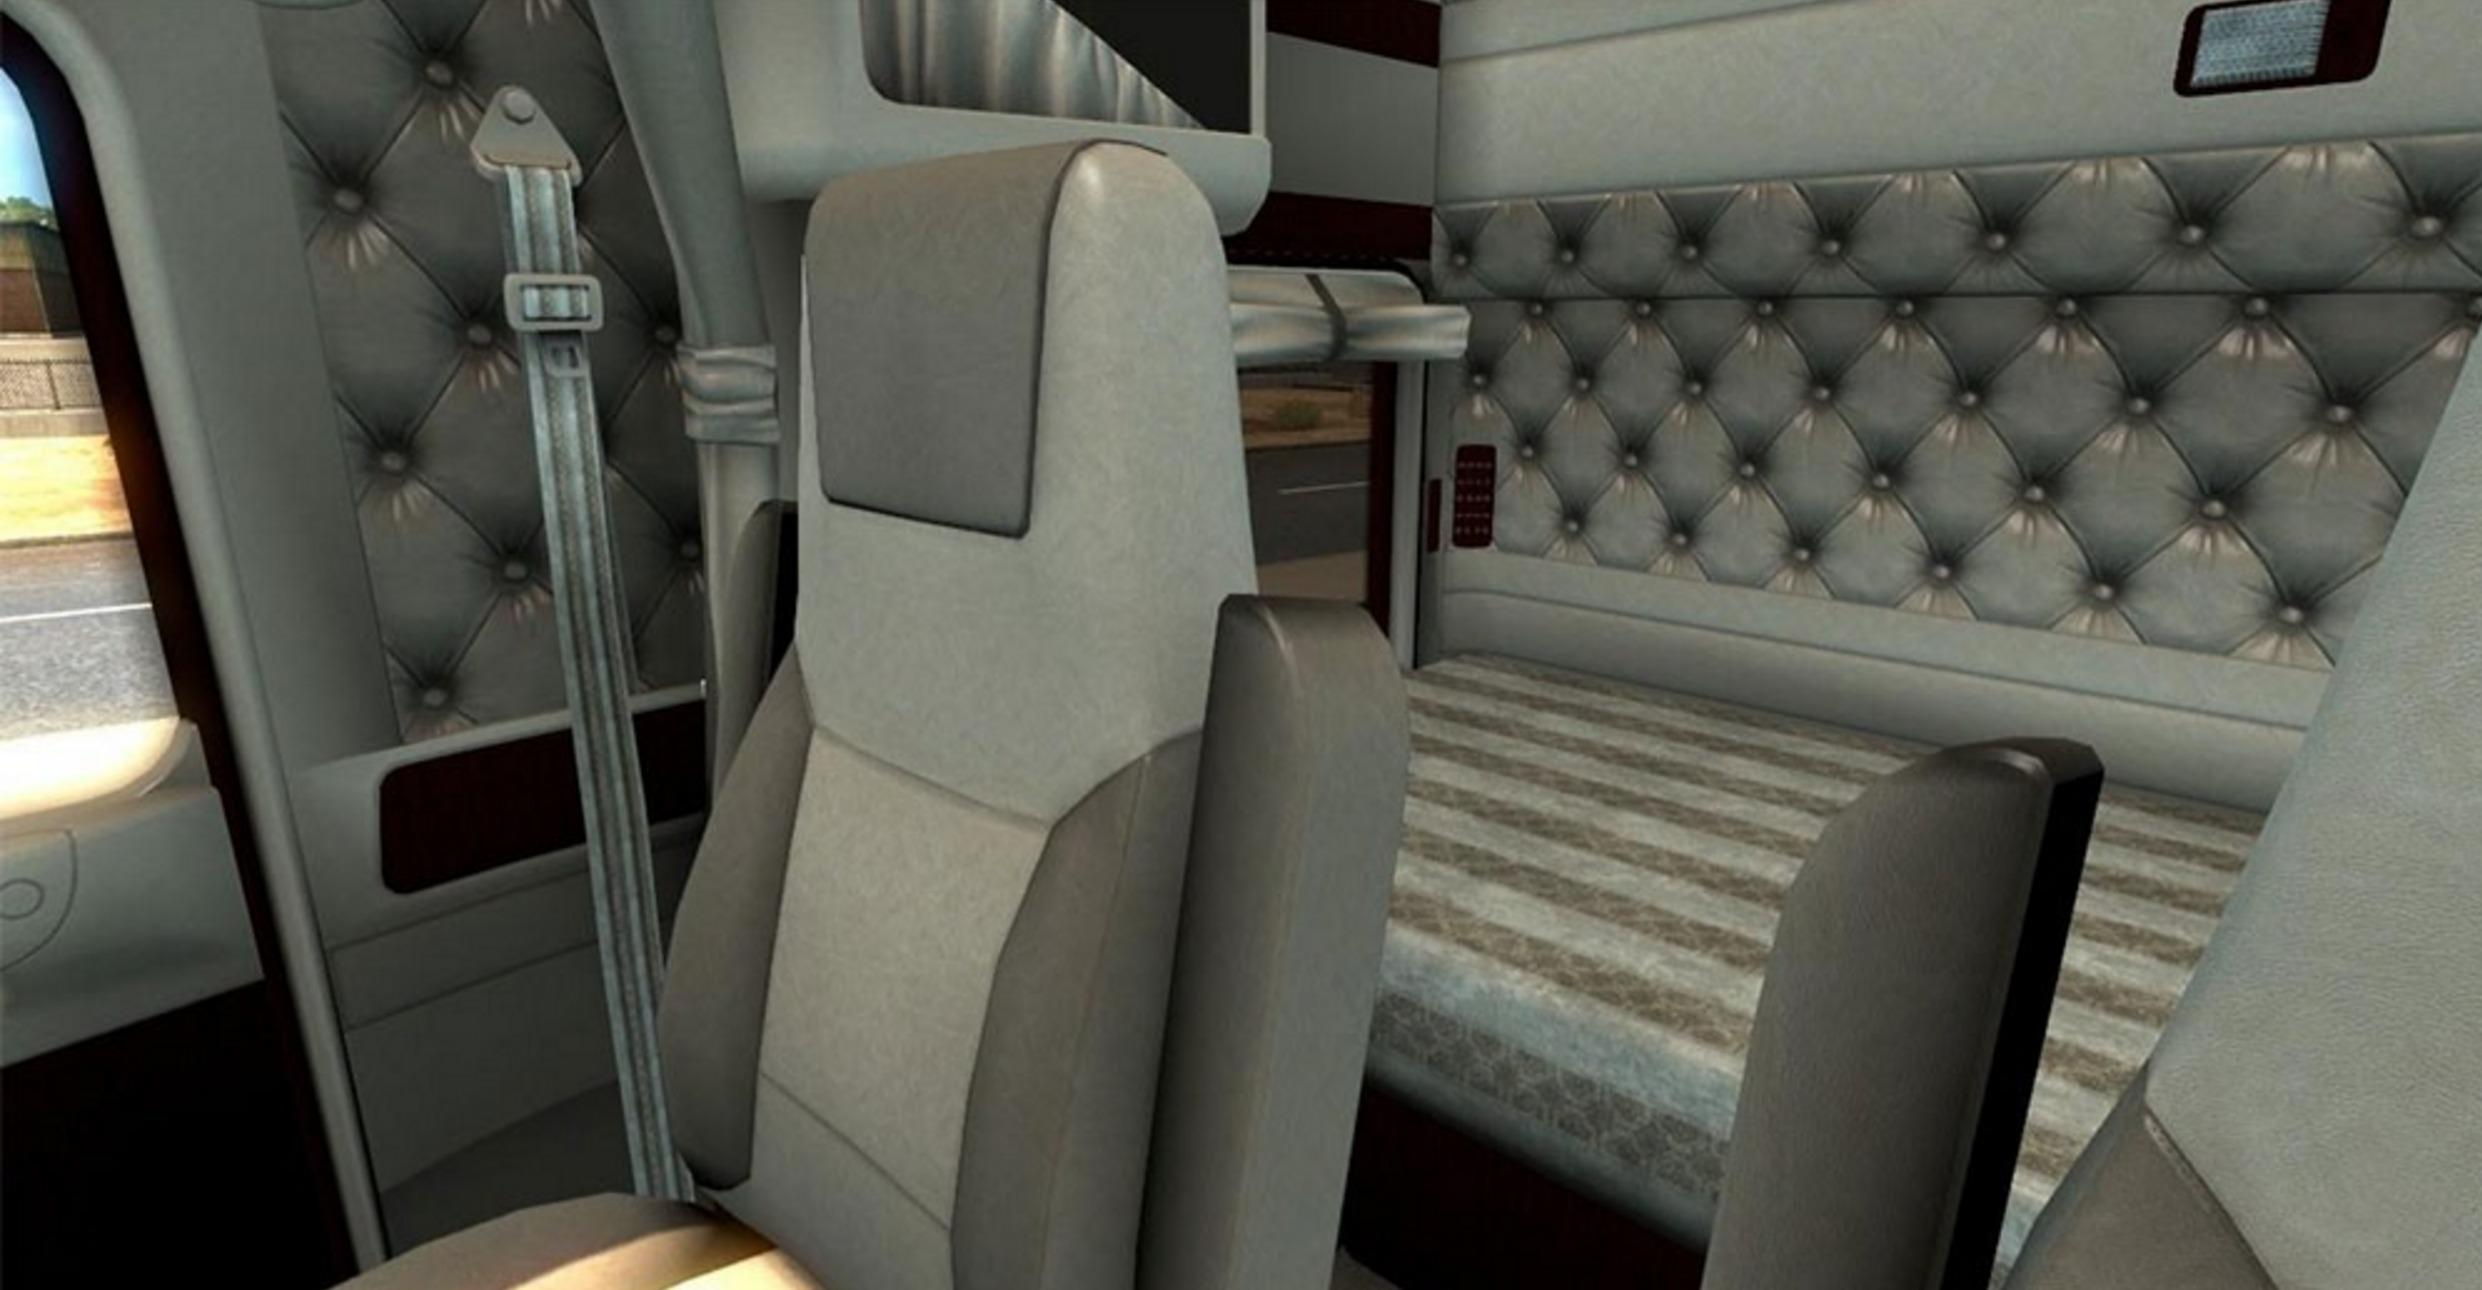 kenworth w900 lux interior v2 for truck for ats ats mod american truck simulator mod. Black Bedroom Furniture Sets. Home Design Ideas